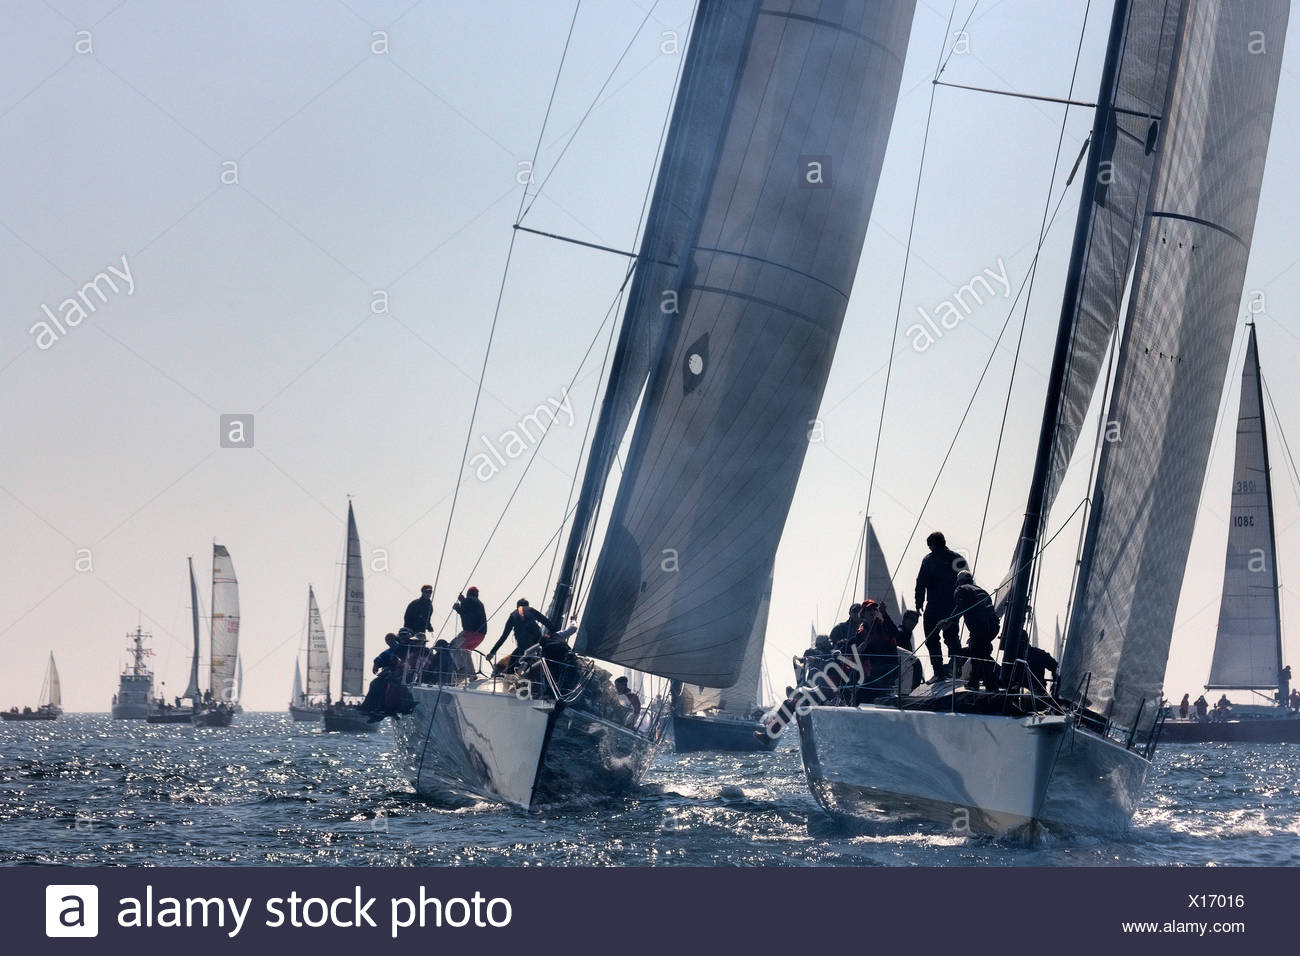 An international yachting race near Victoria, British Columbia. - Stock Image